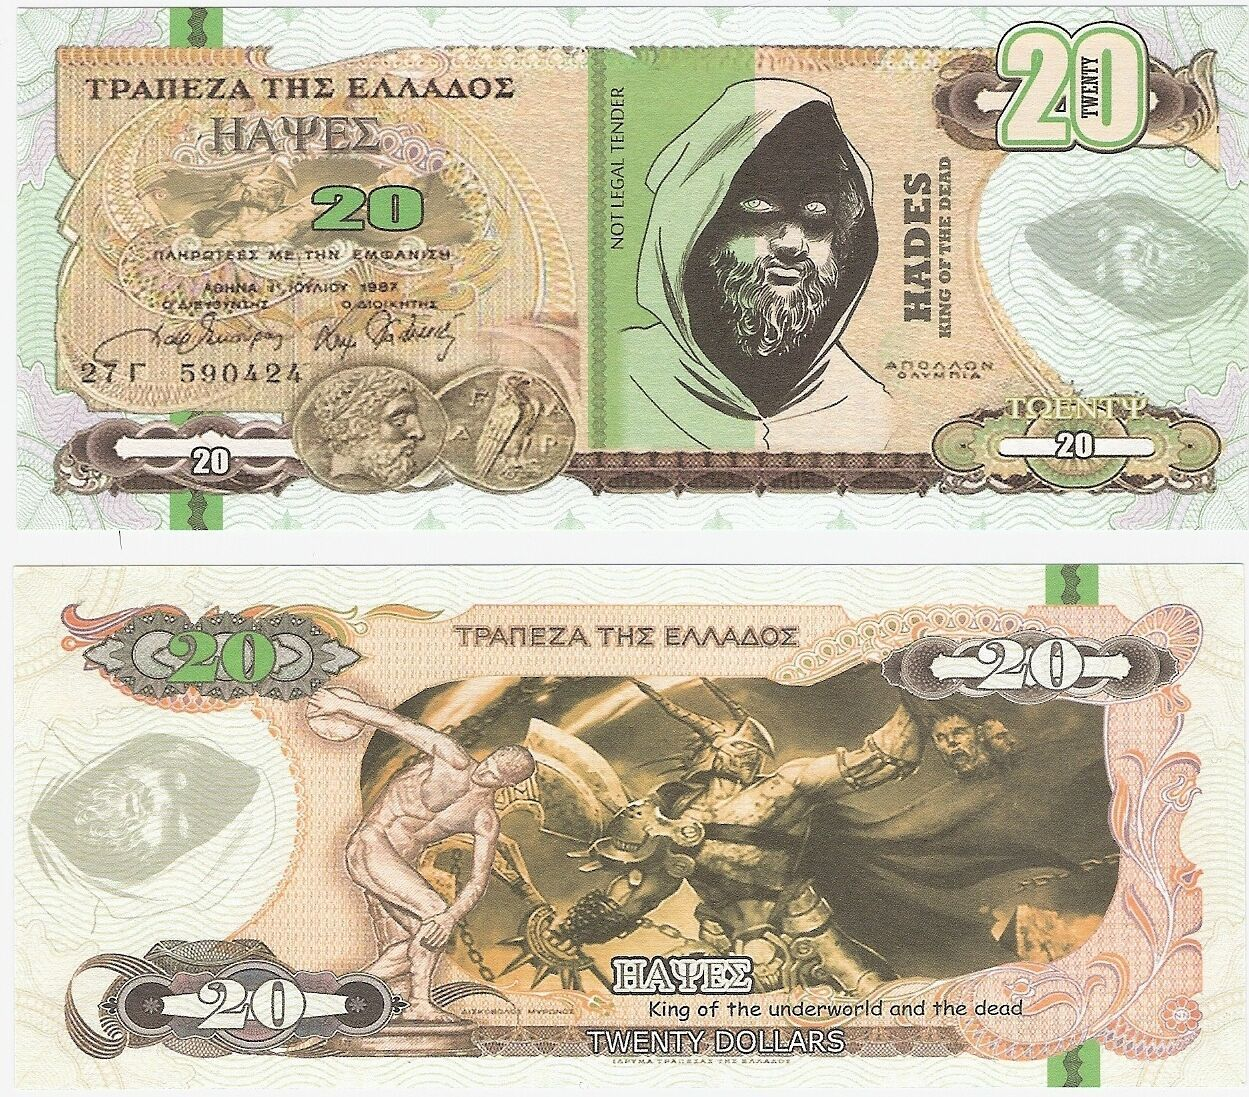 5 pcs Greece 10 20 50 100 1000 Dollars 2014 UNC God Banknote Set